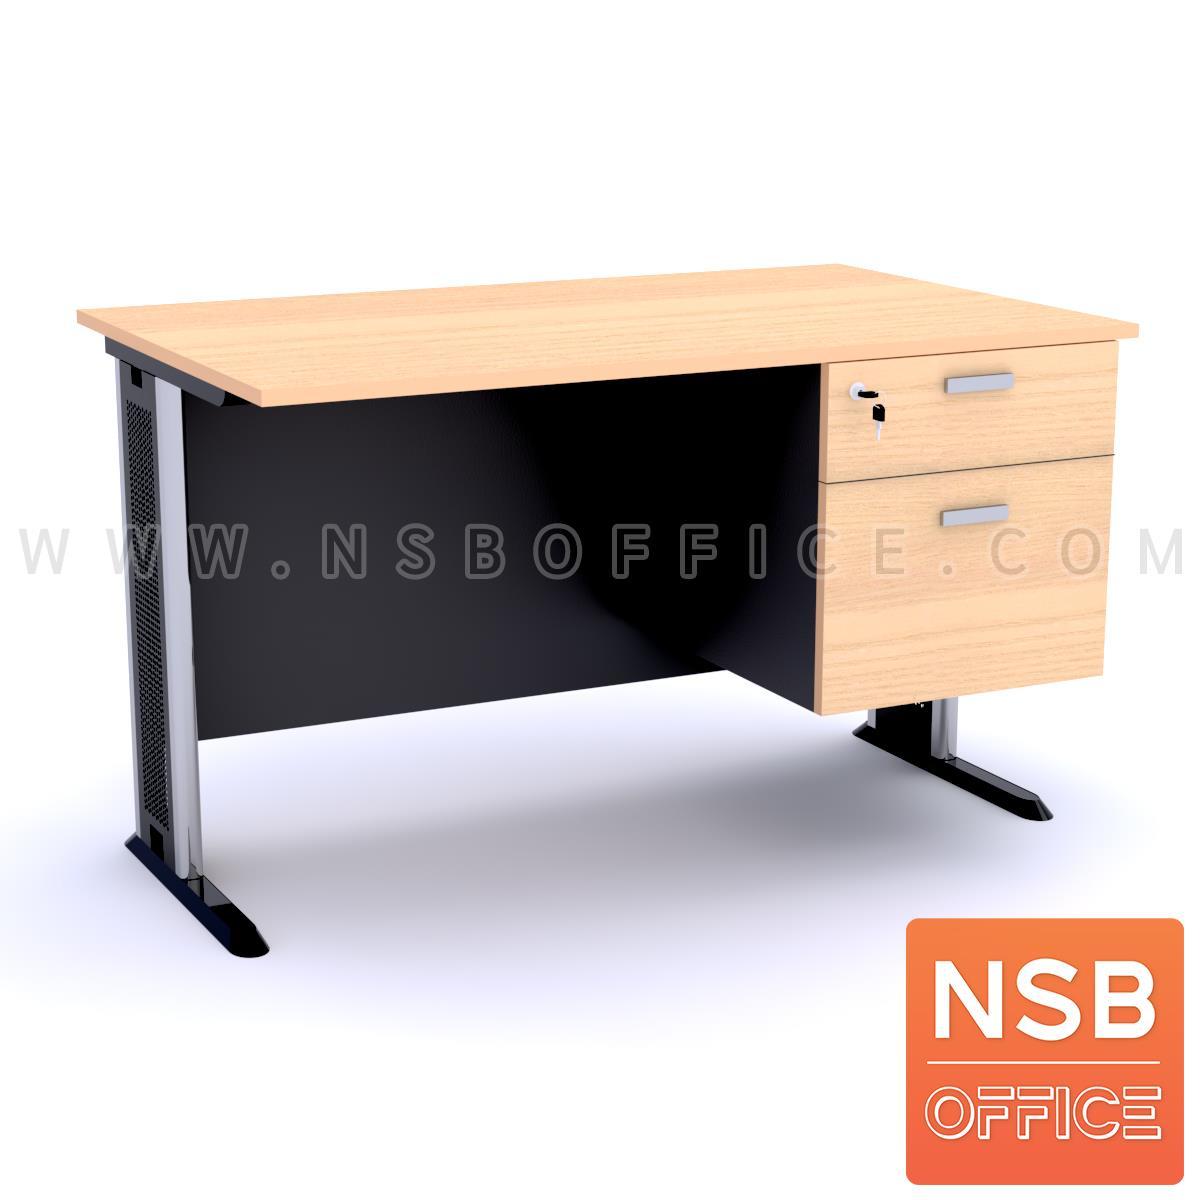 A10A037:โต๊ะทำงาน 2 ลิ้นชัก  120W, 135W, 150W, 180W (75D, 80D) cm. บังตาไม้ ขาเหล็กตัวแอล